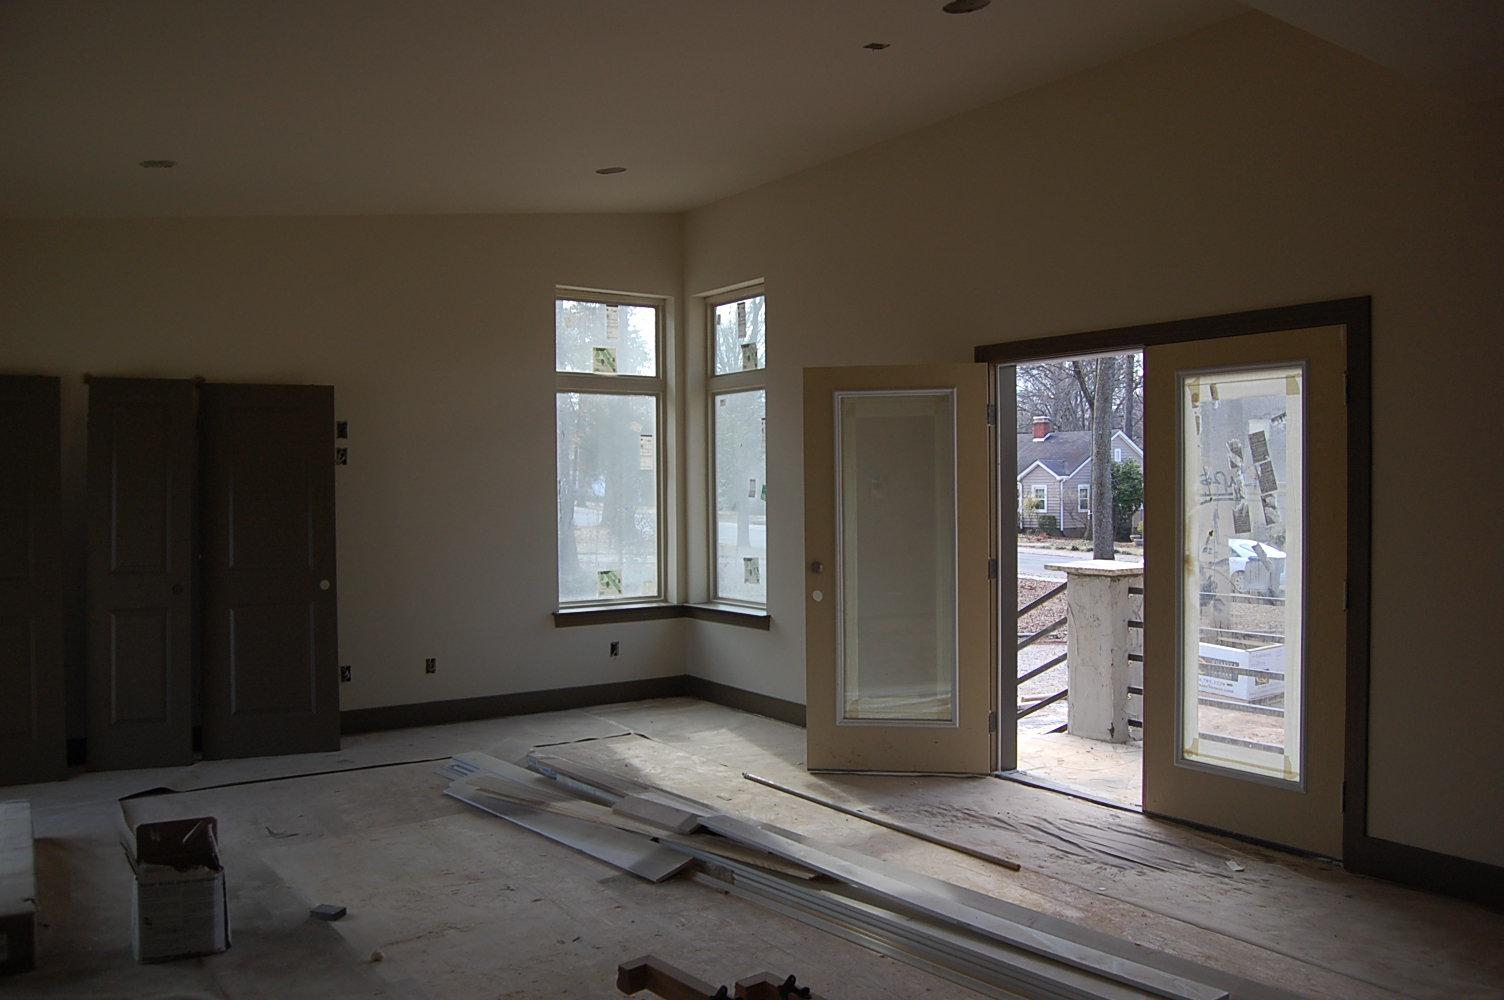 Expert In Home Staging, Interior Design & Interior